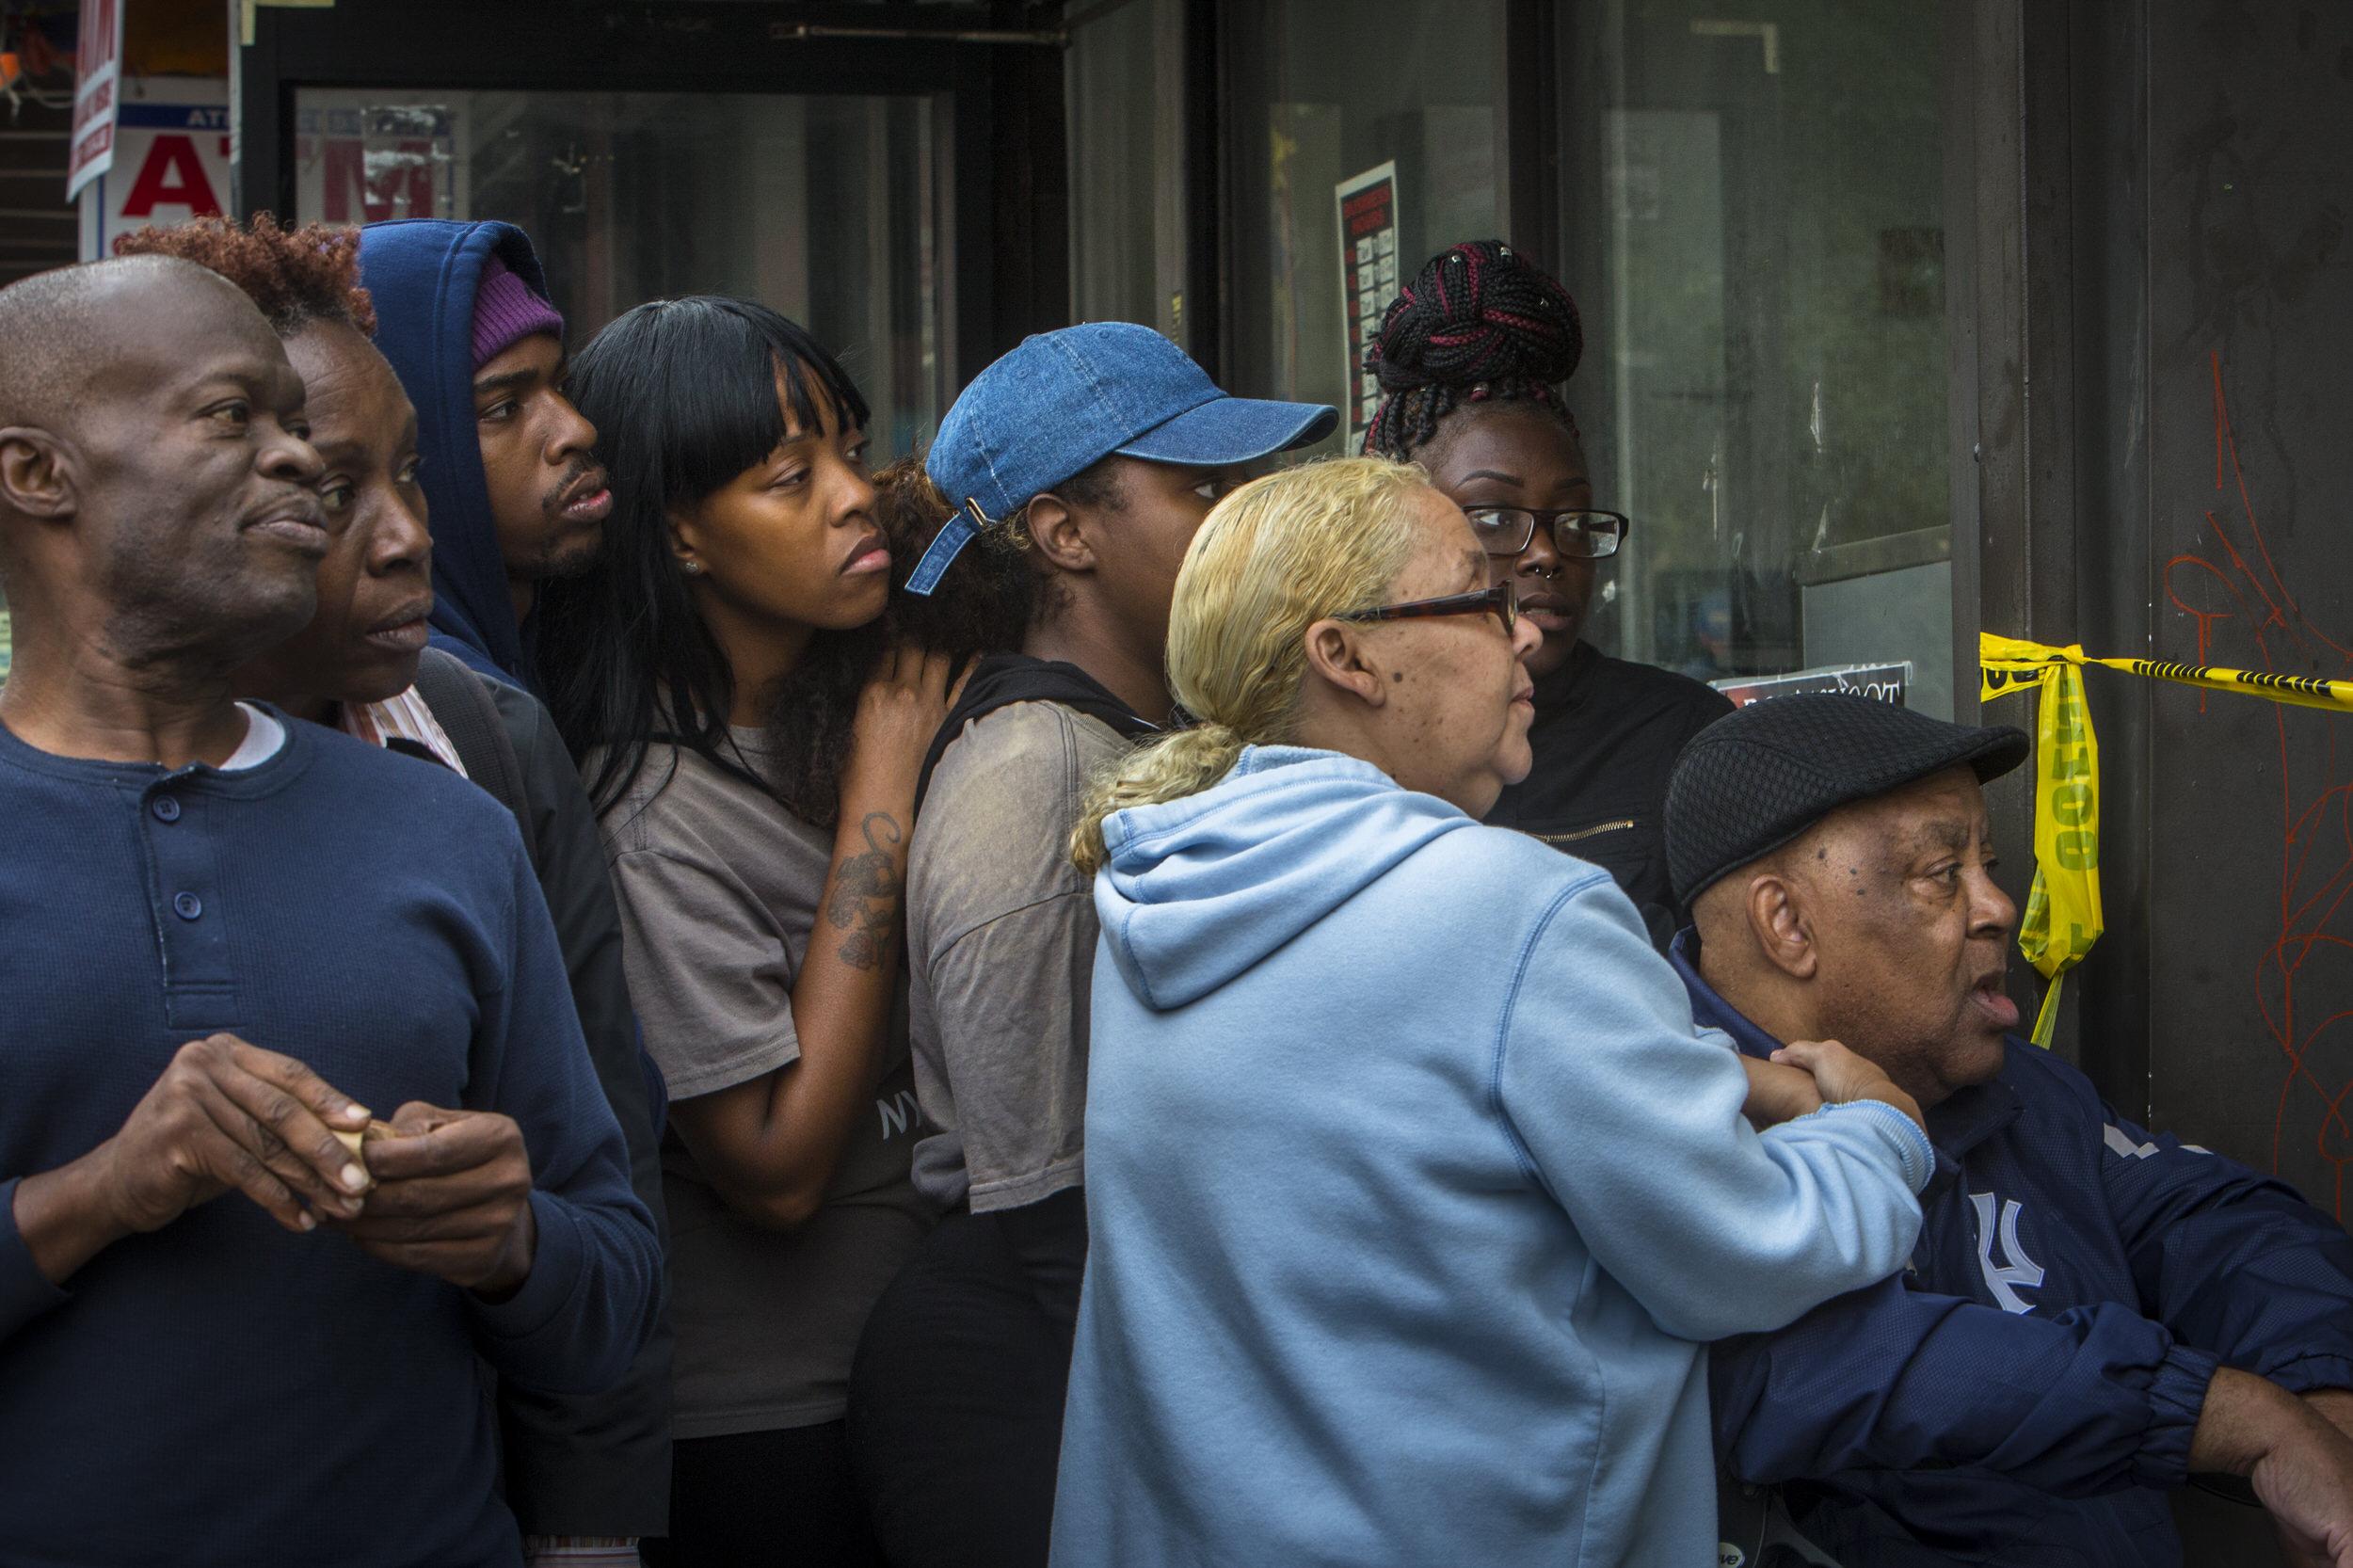 Onlookers following a police shooting in Bedford-Stuyvesant, Brooklyn.